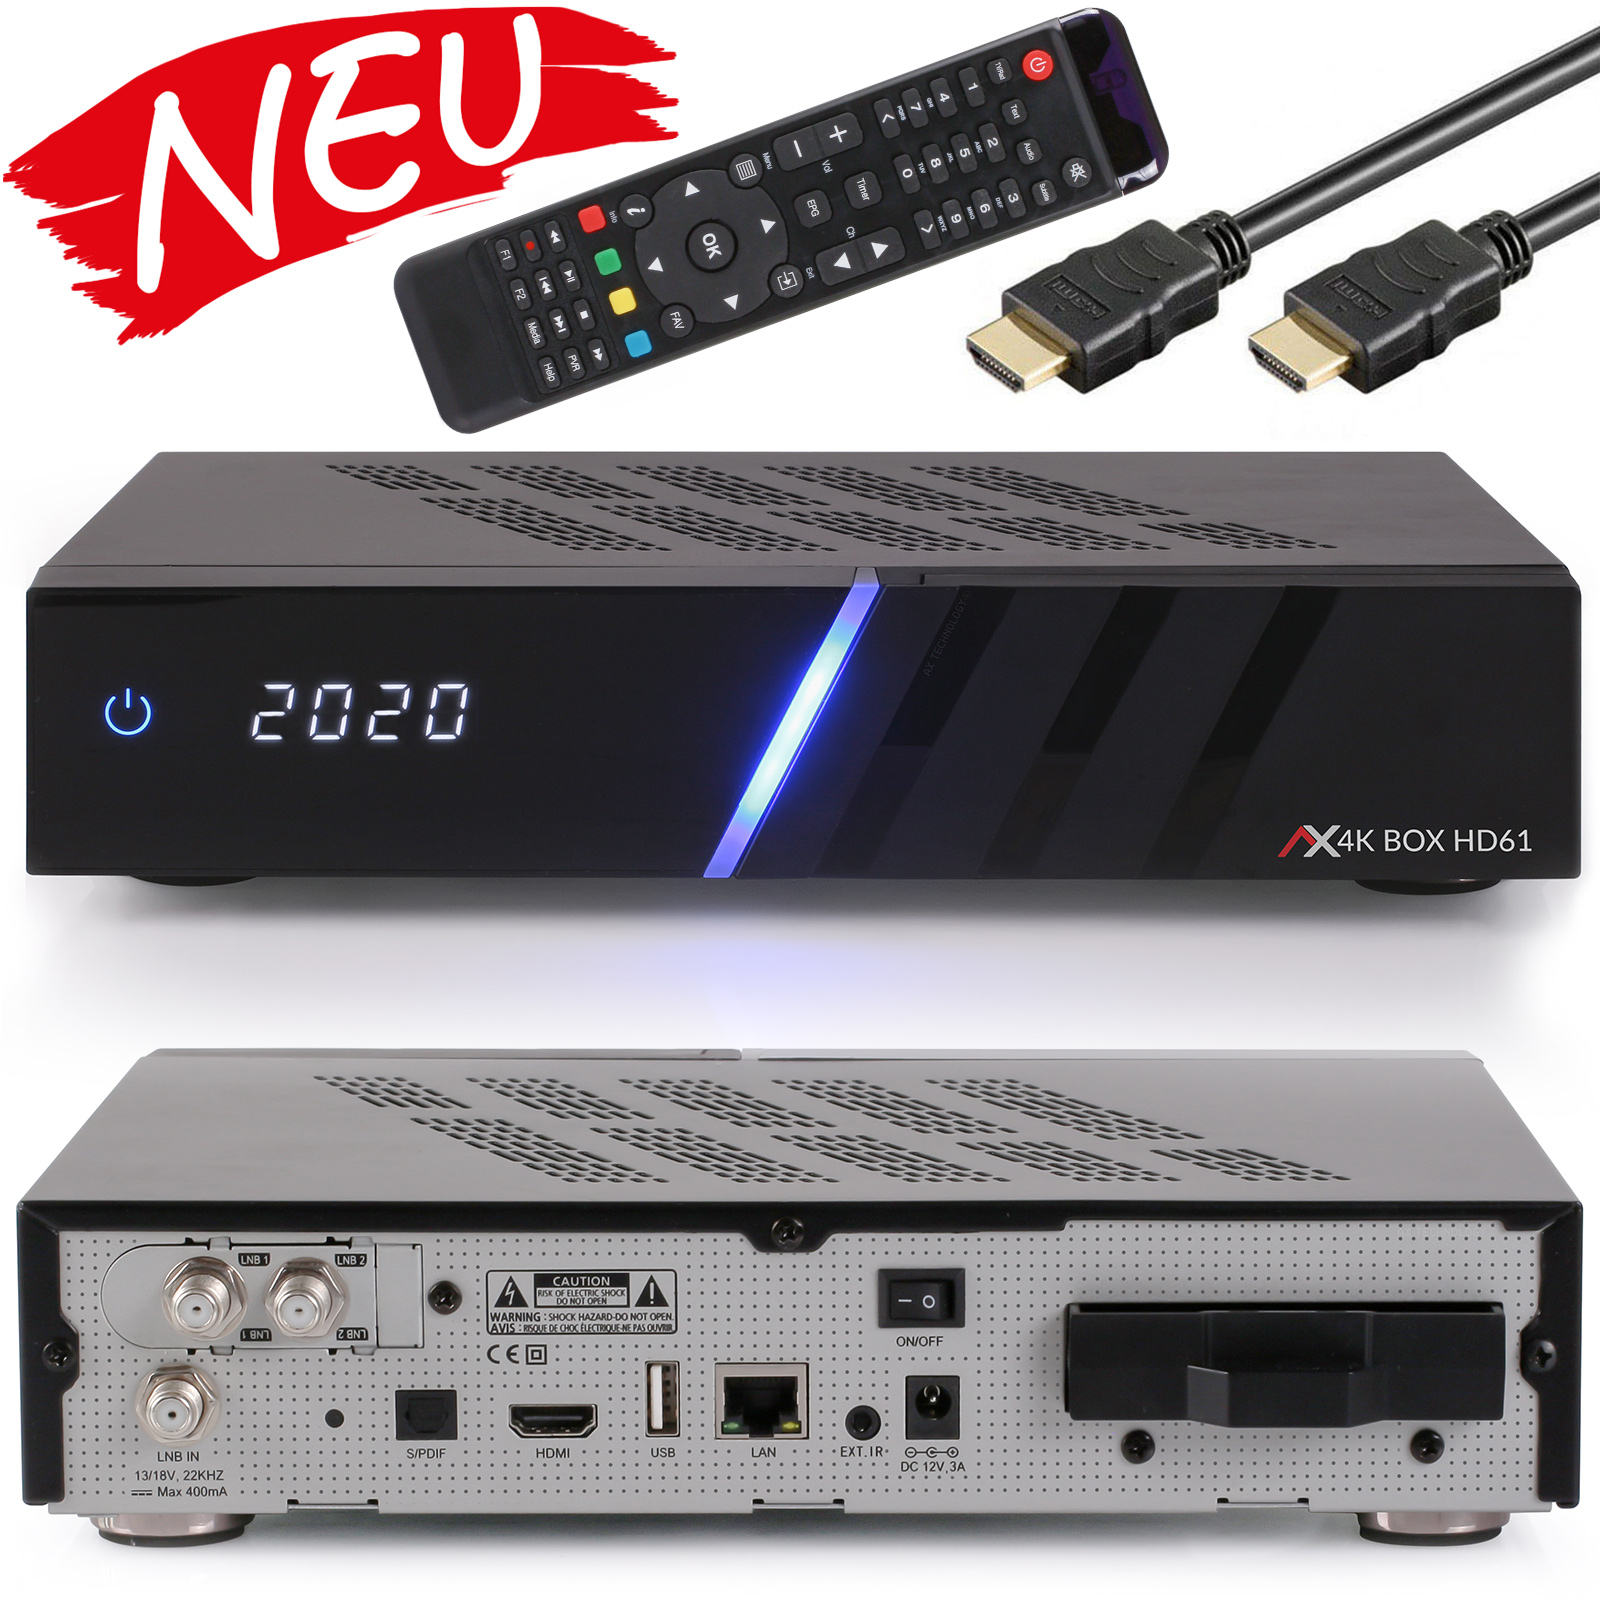 AX 4K-BOX HD61 UHD 2160p E2 Linux 2xDVB-S2 Receiver, ohne HDD